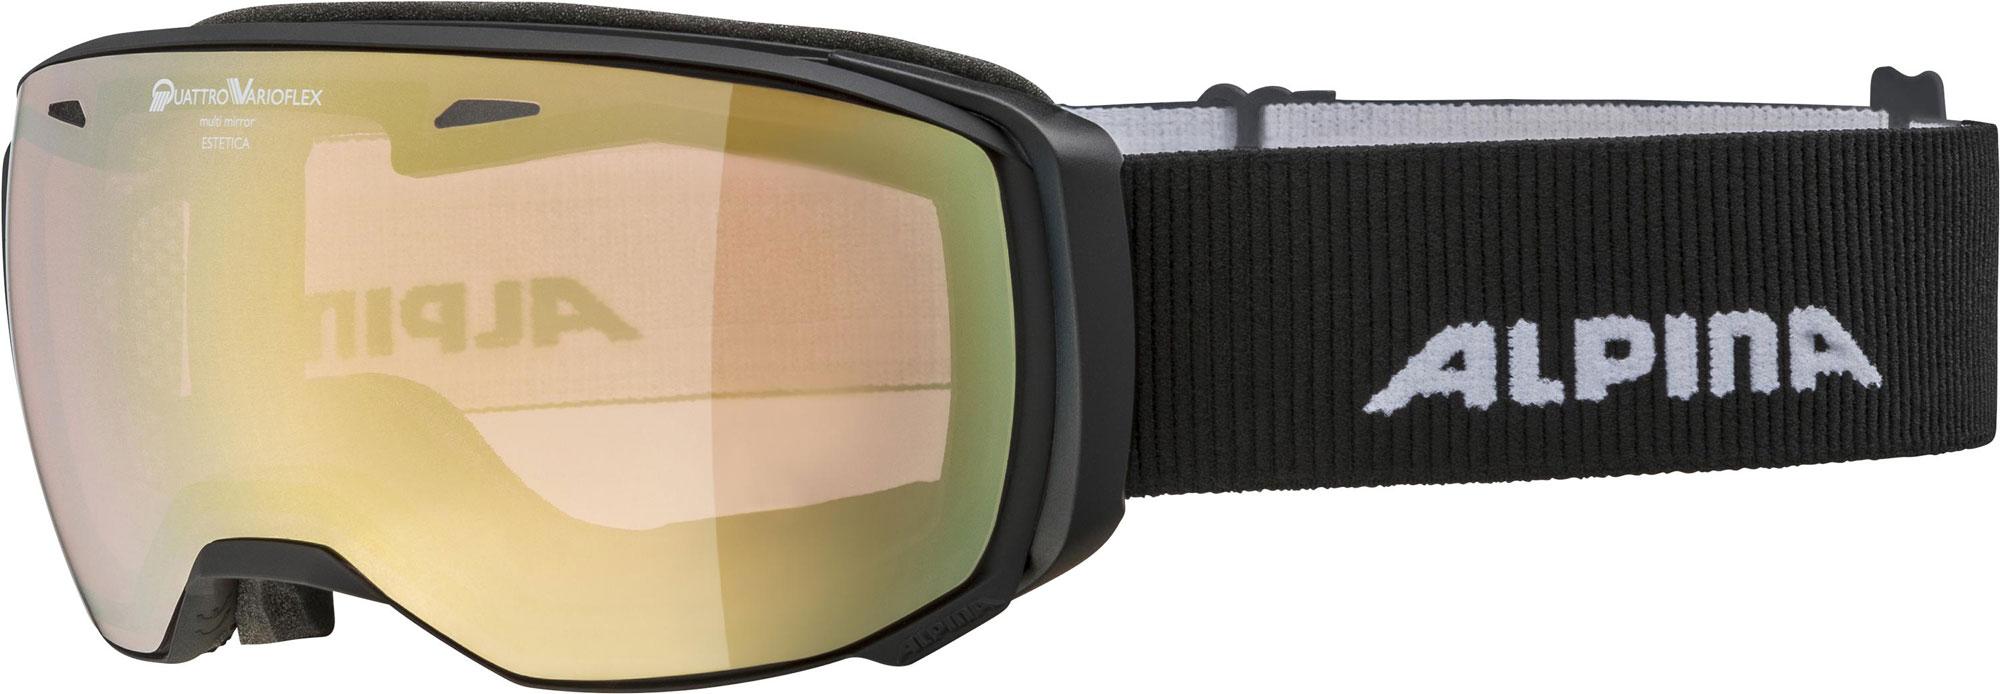 Alpina Estetica - black matt QVM gold - Damen/Mädchen Skibrille